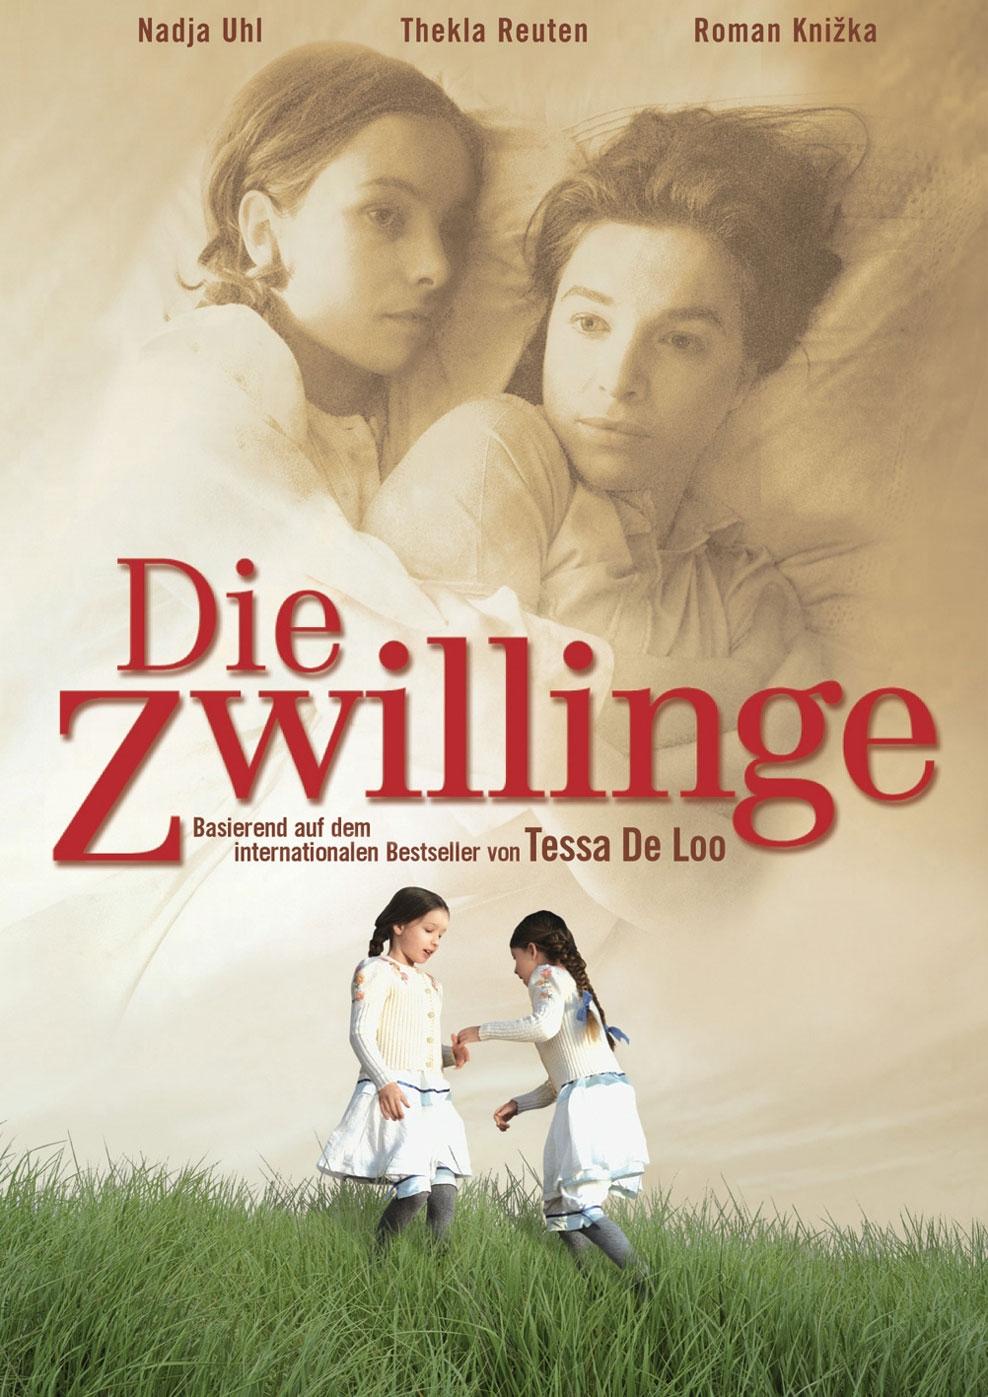 Die Zwillinge (Poster)